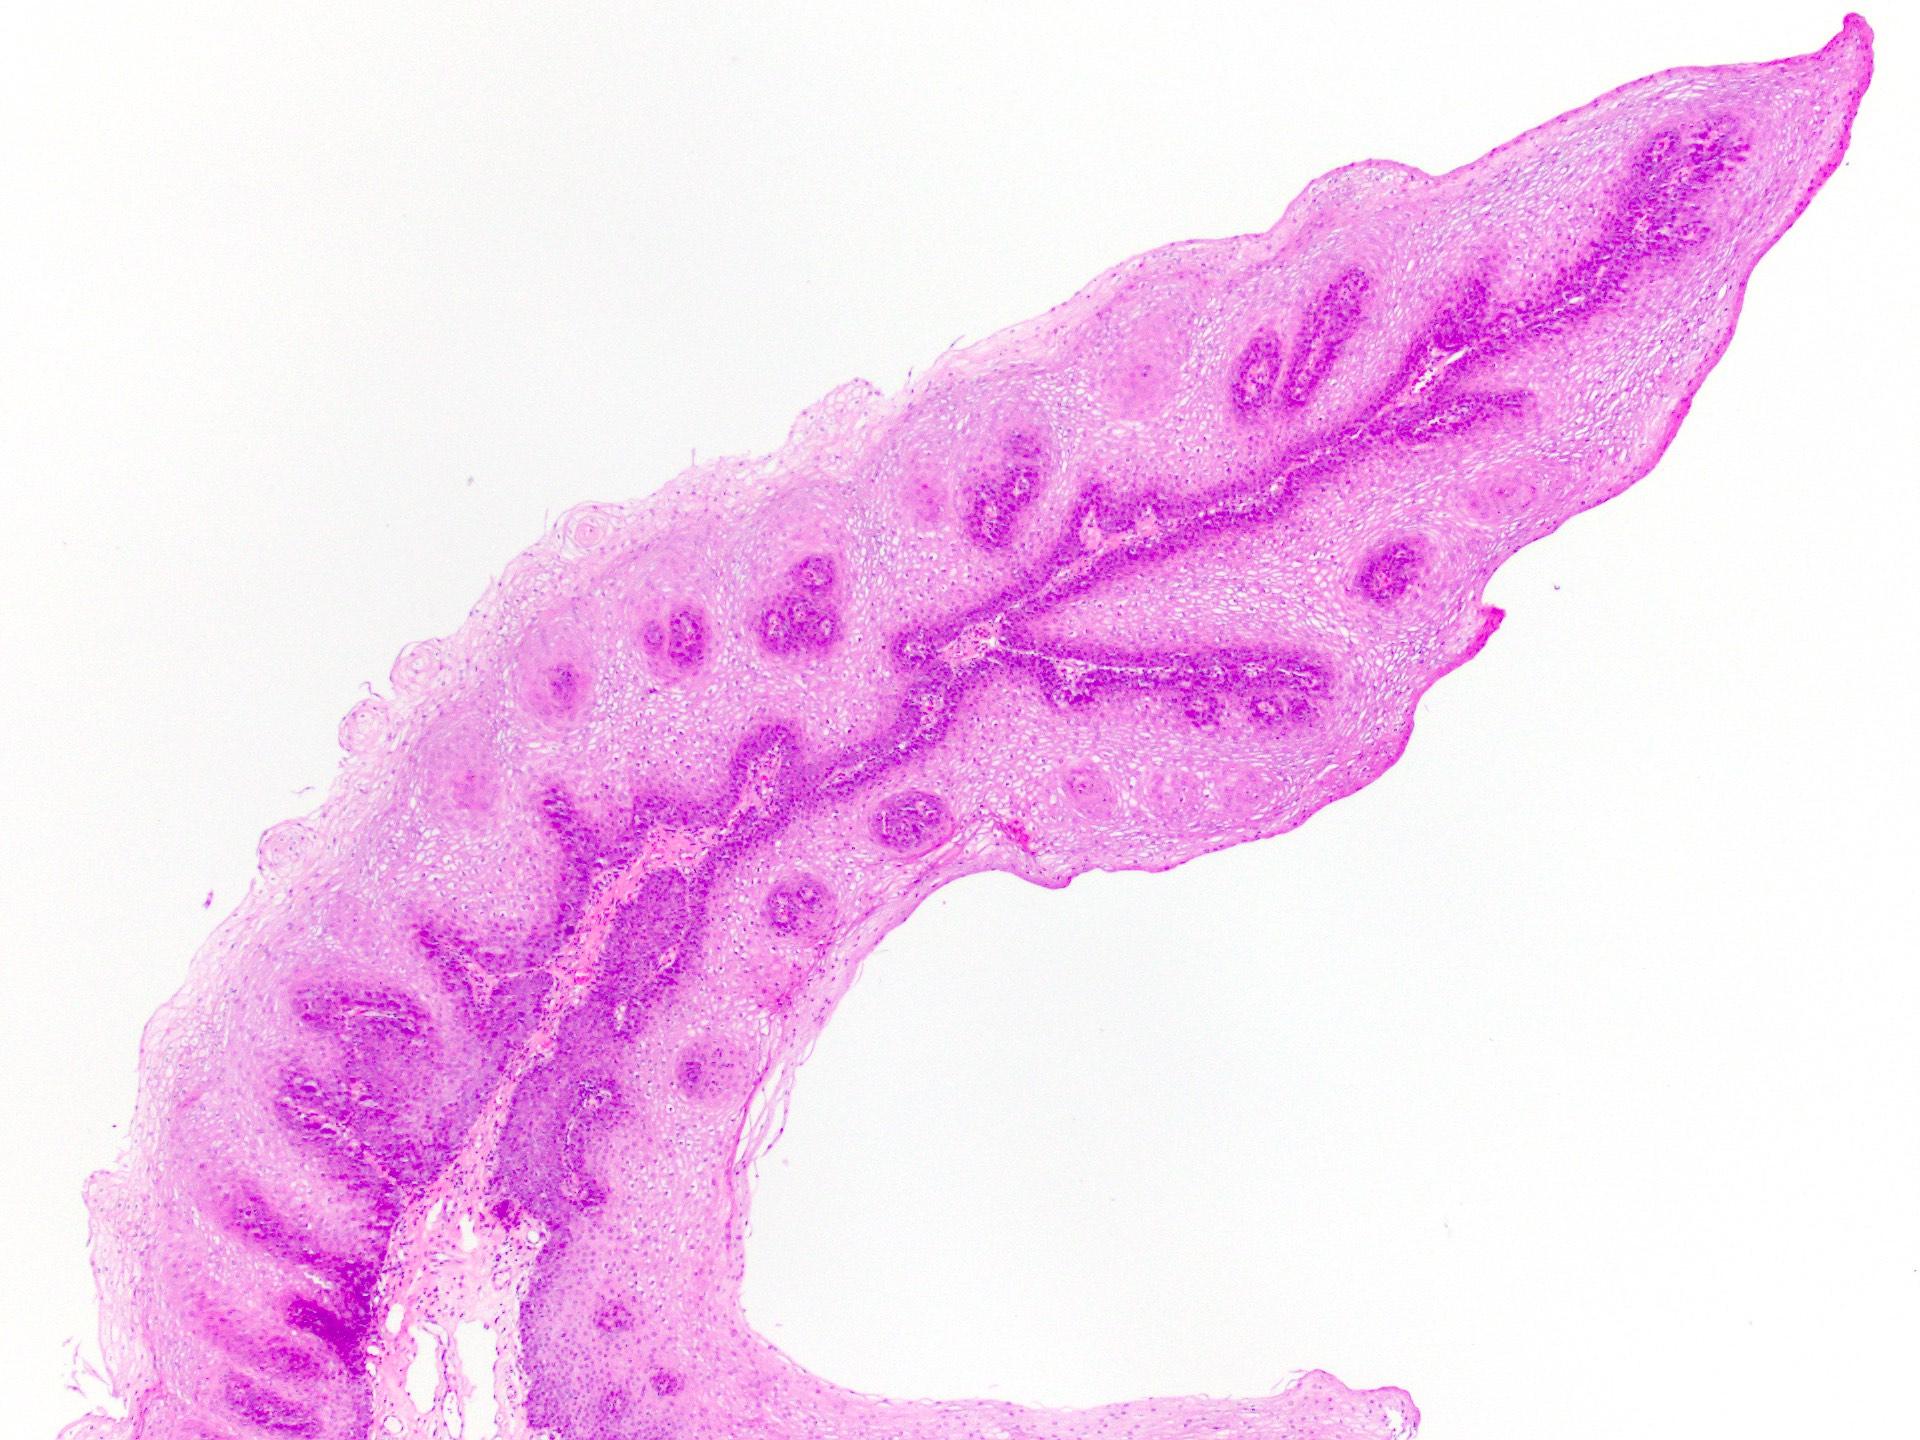 fordított papilloma patológia körvonalai